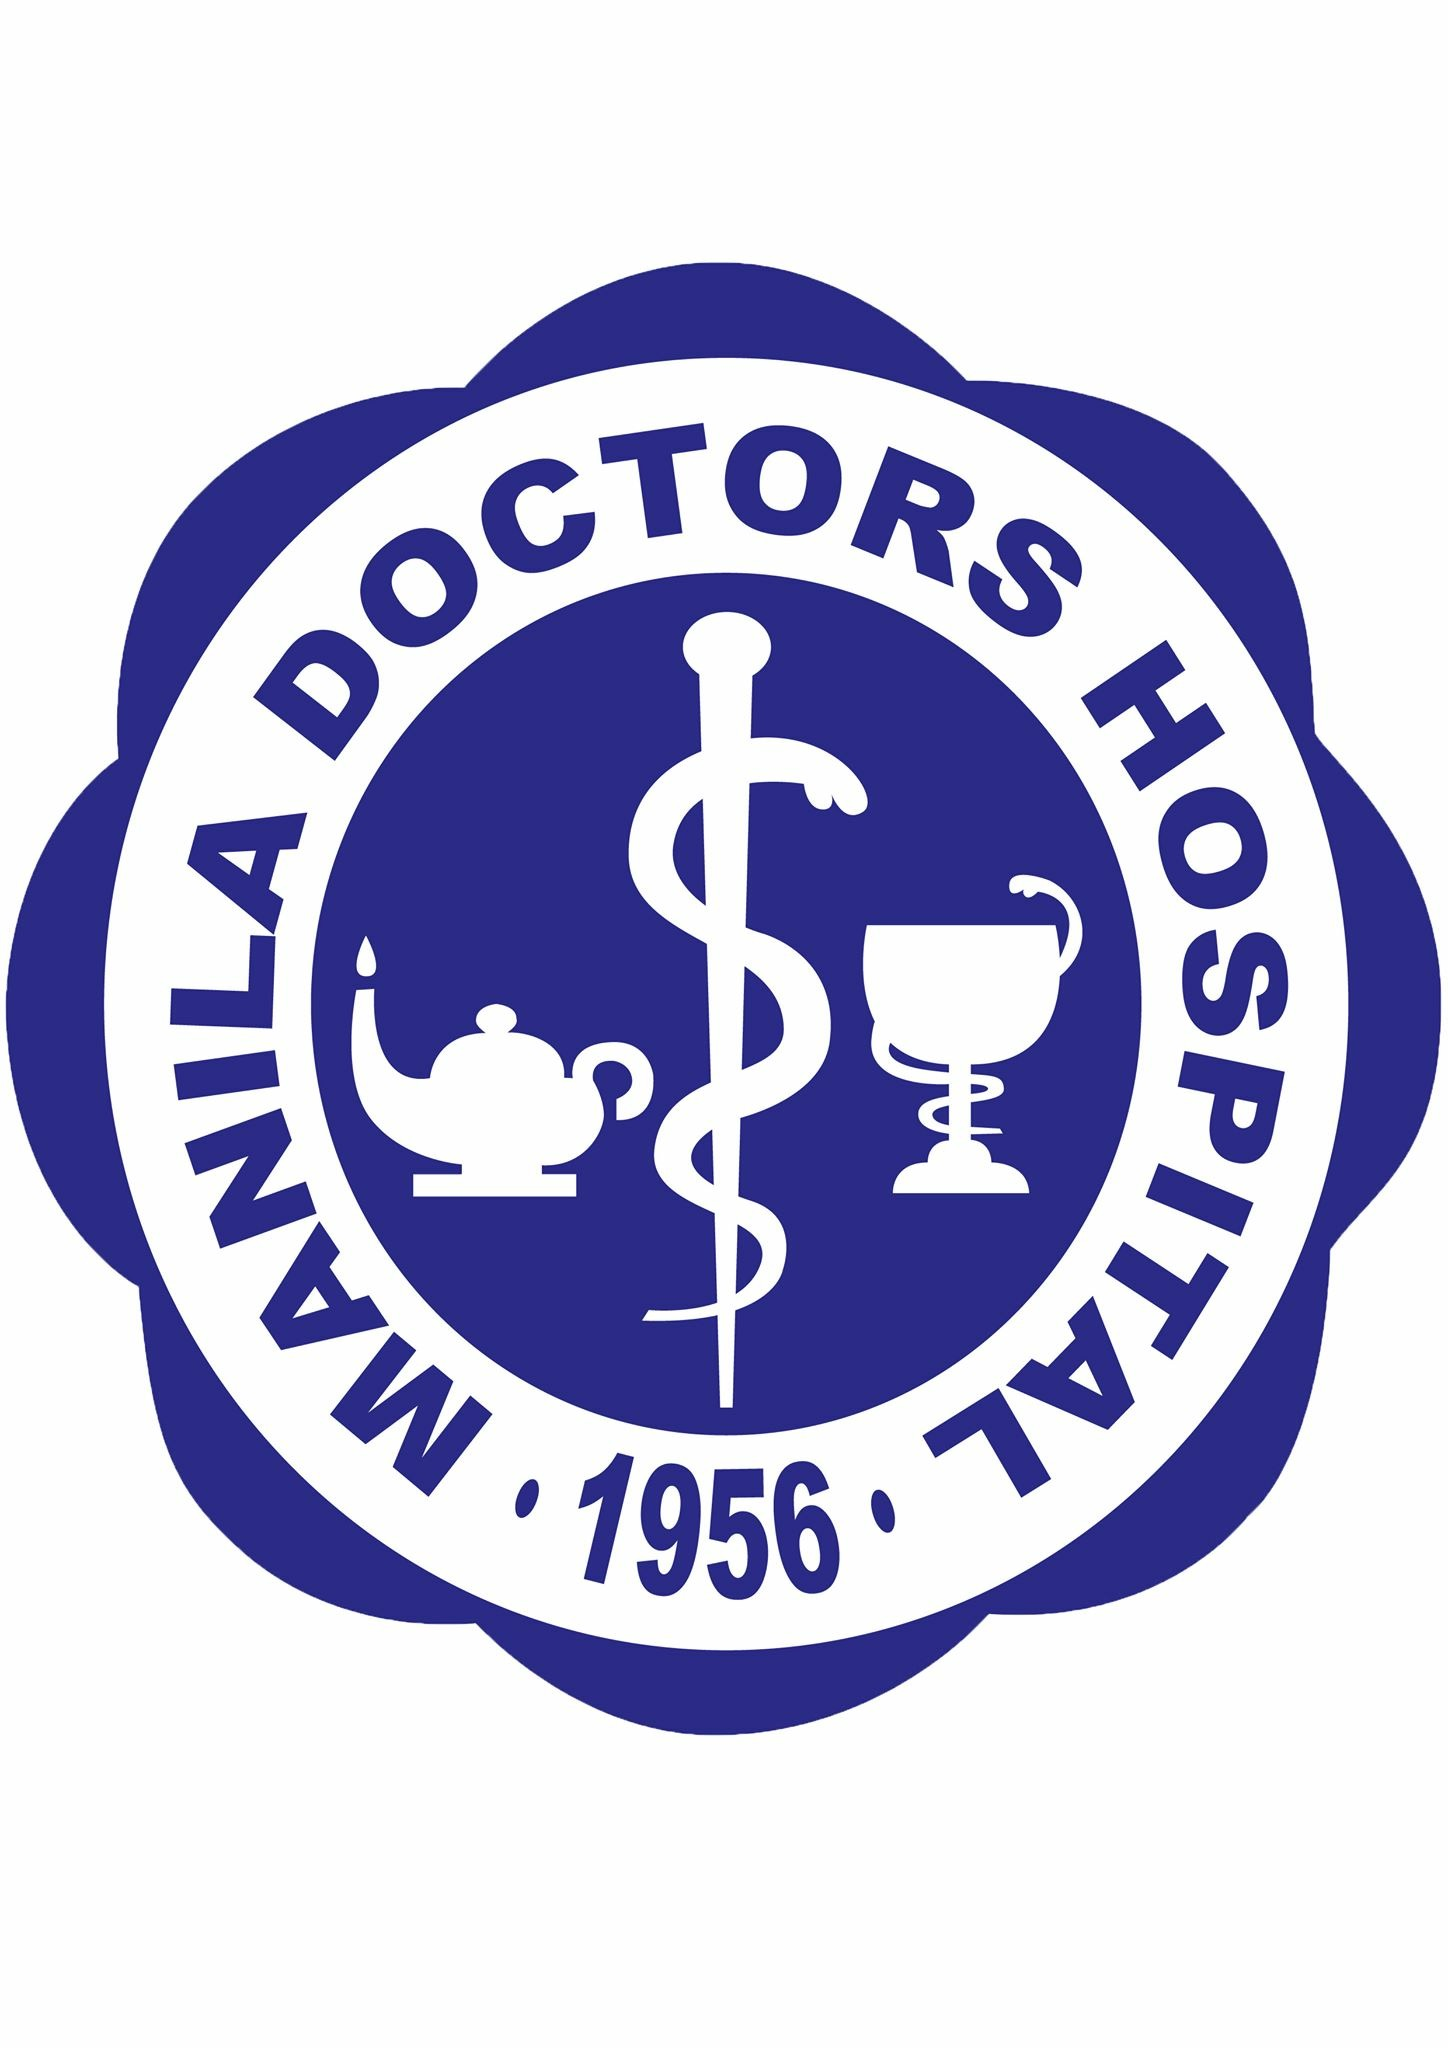 Manila Doctors Hospital - Room No. 410